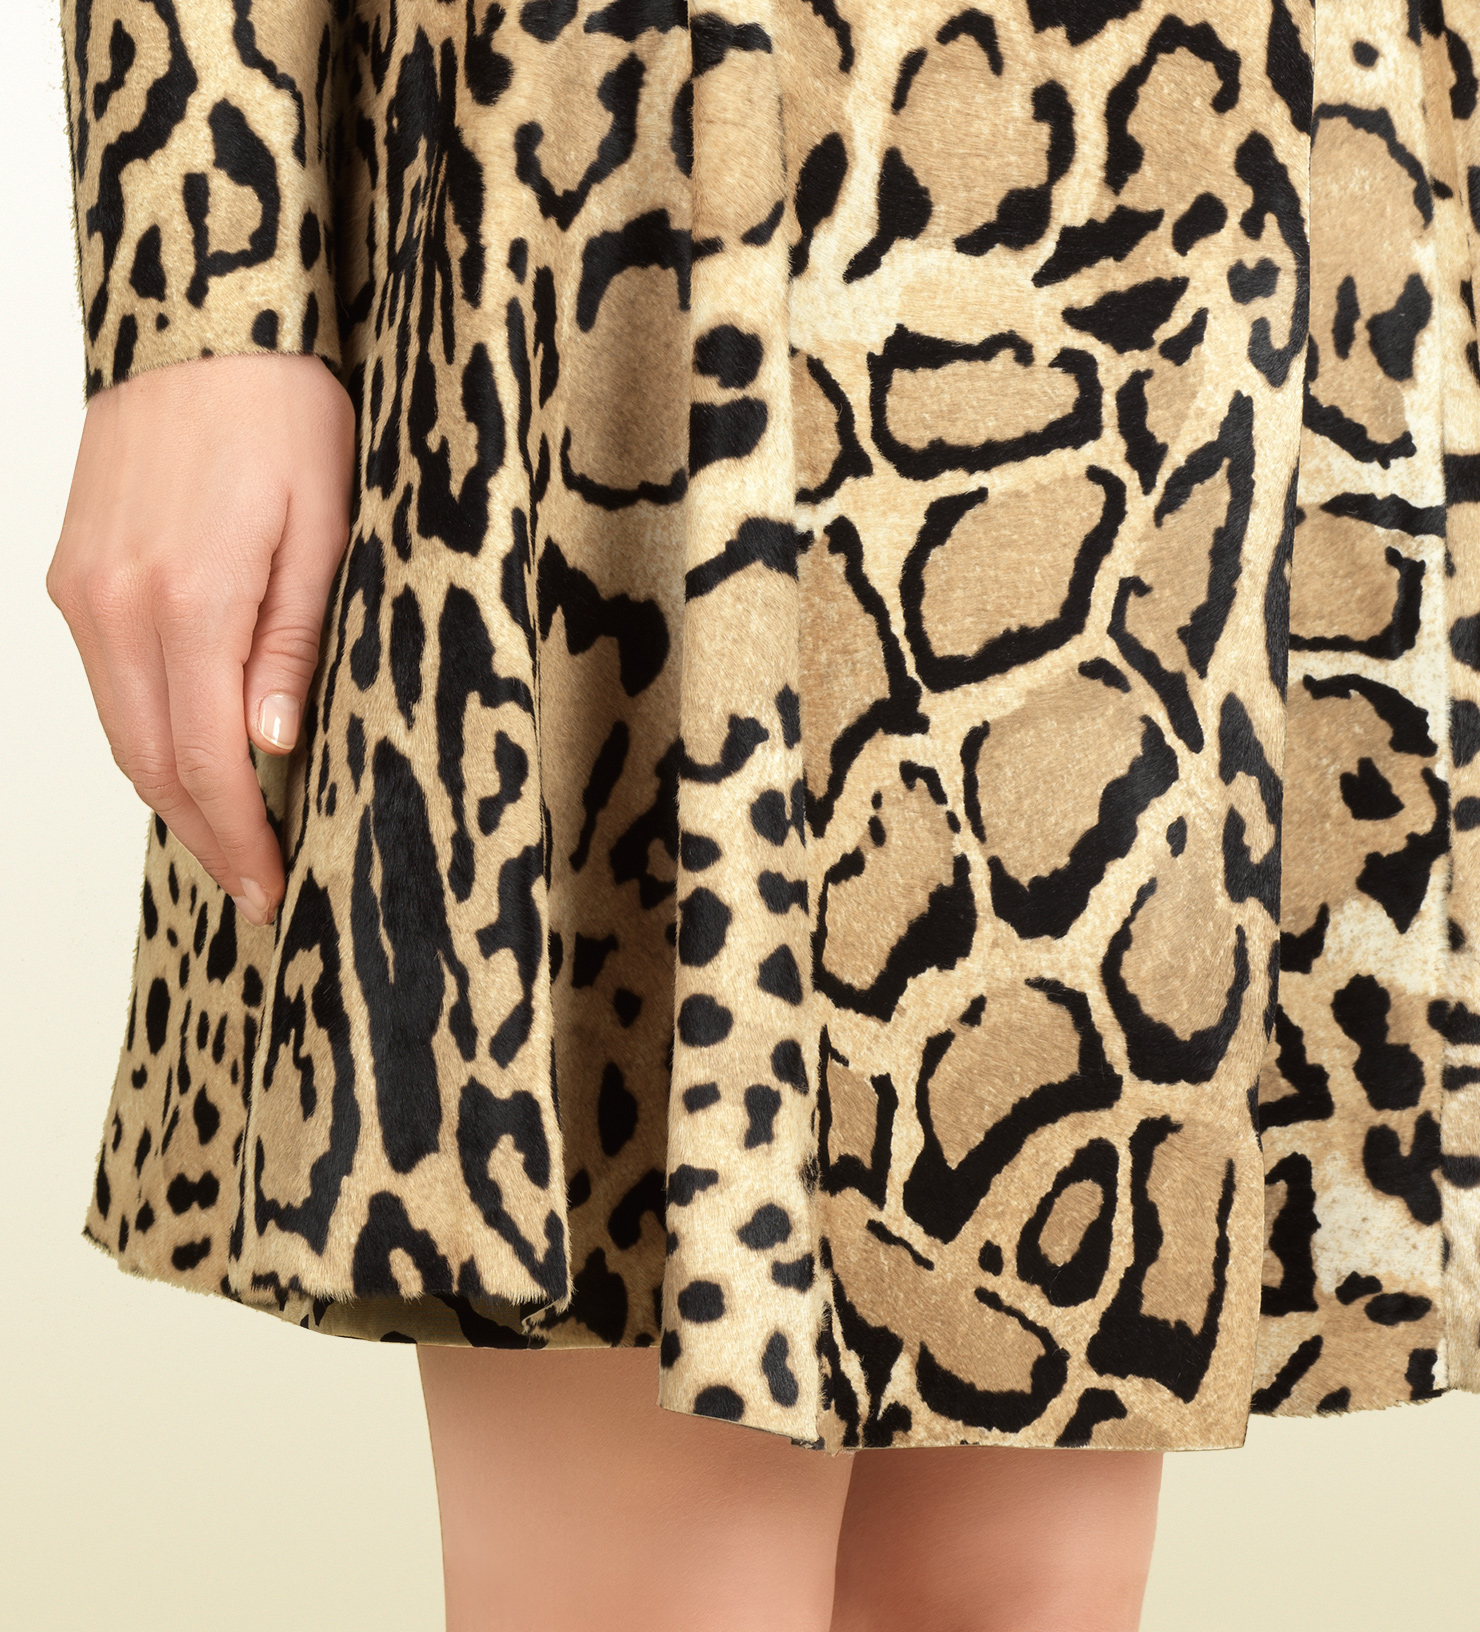 28b1e59ca40e Gucci Leopard Print Calf Hair Coat - Lyst